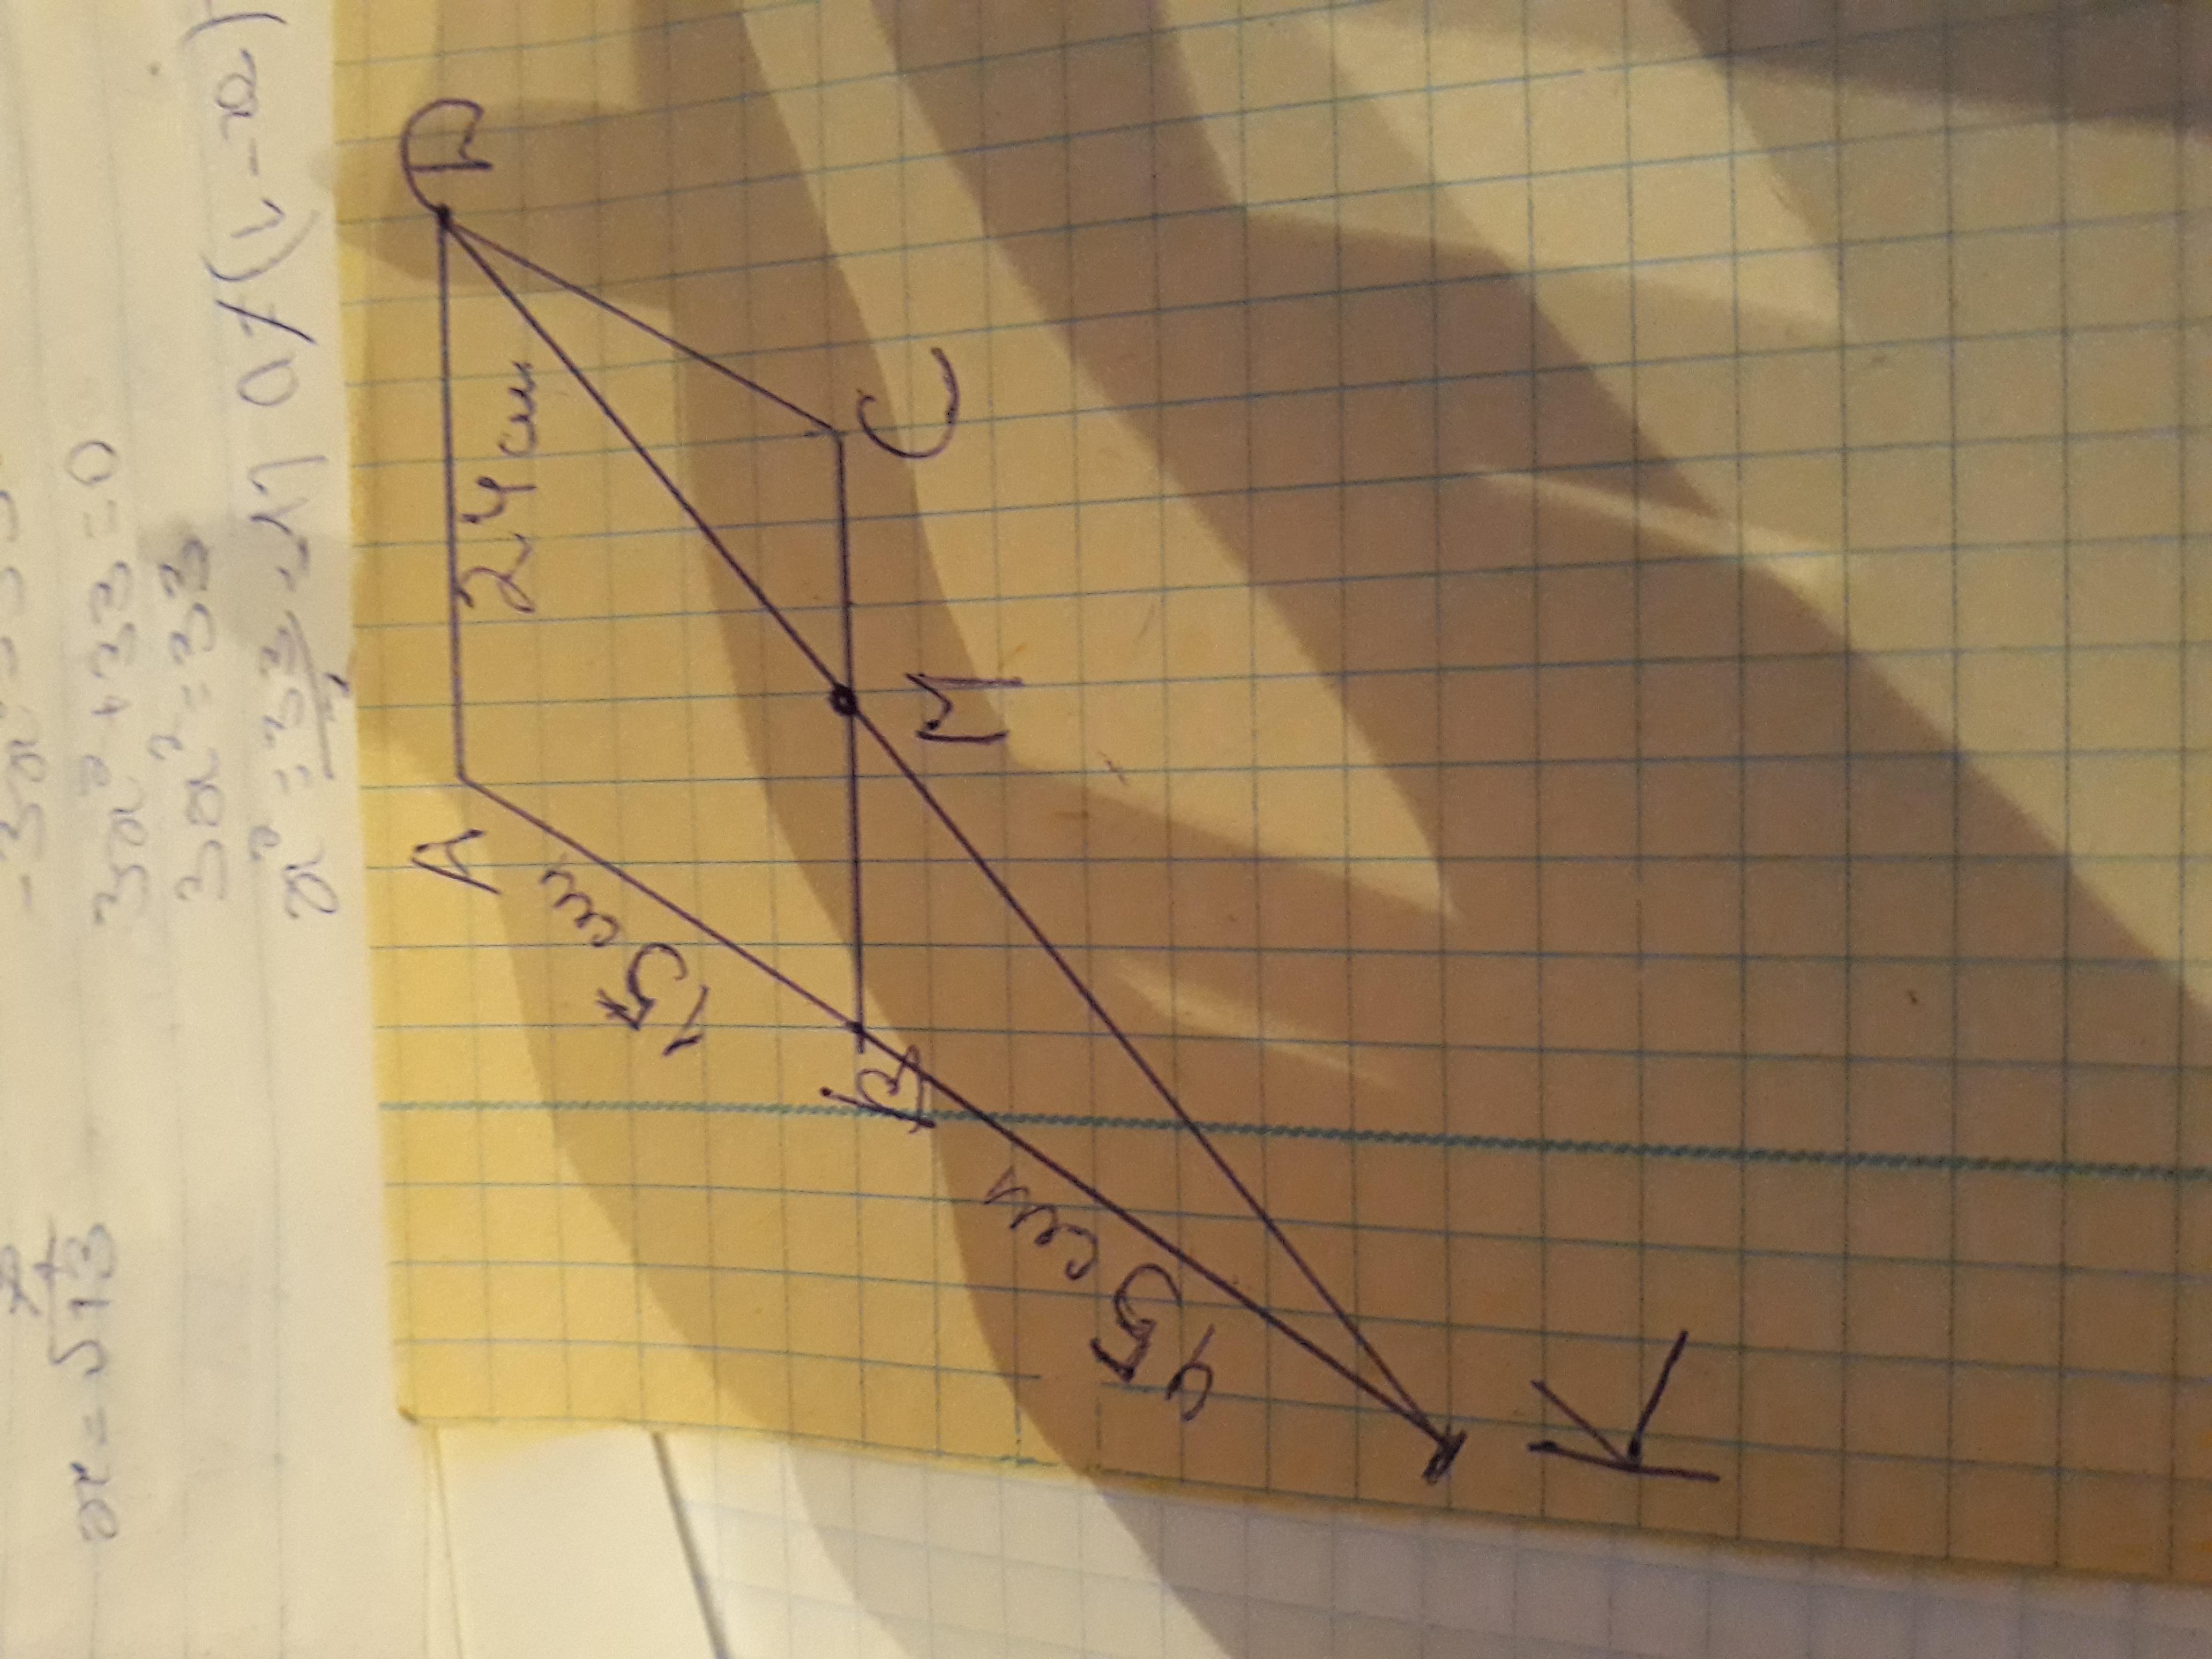 На продолжении стороны AB параллелограмма ABCD